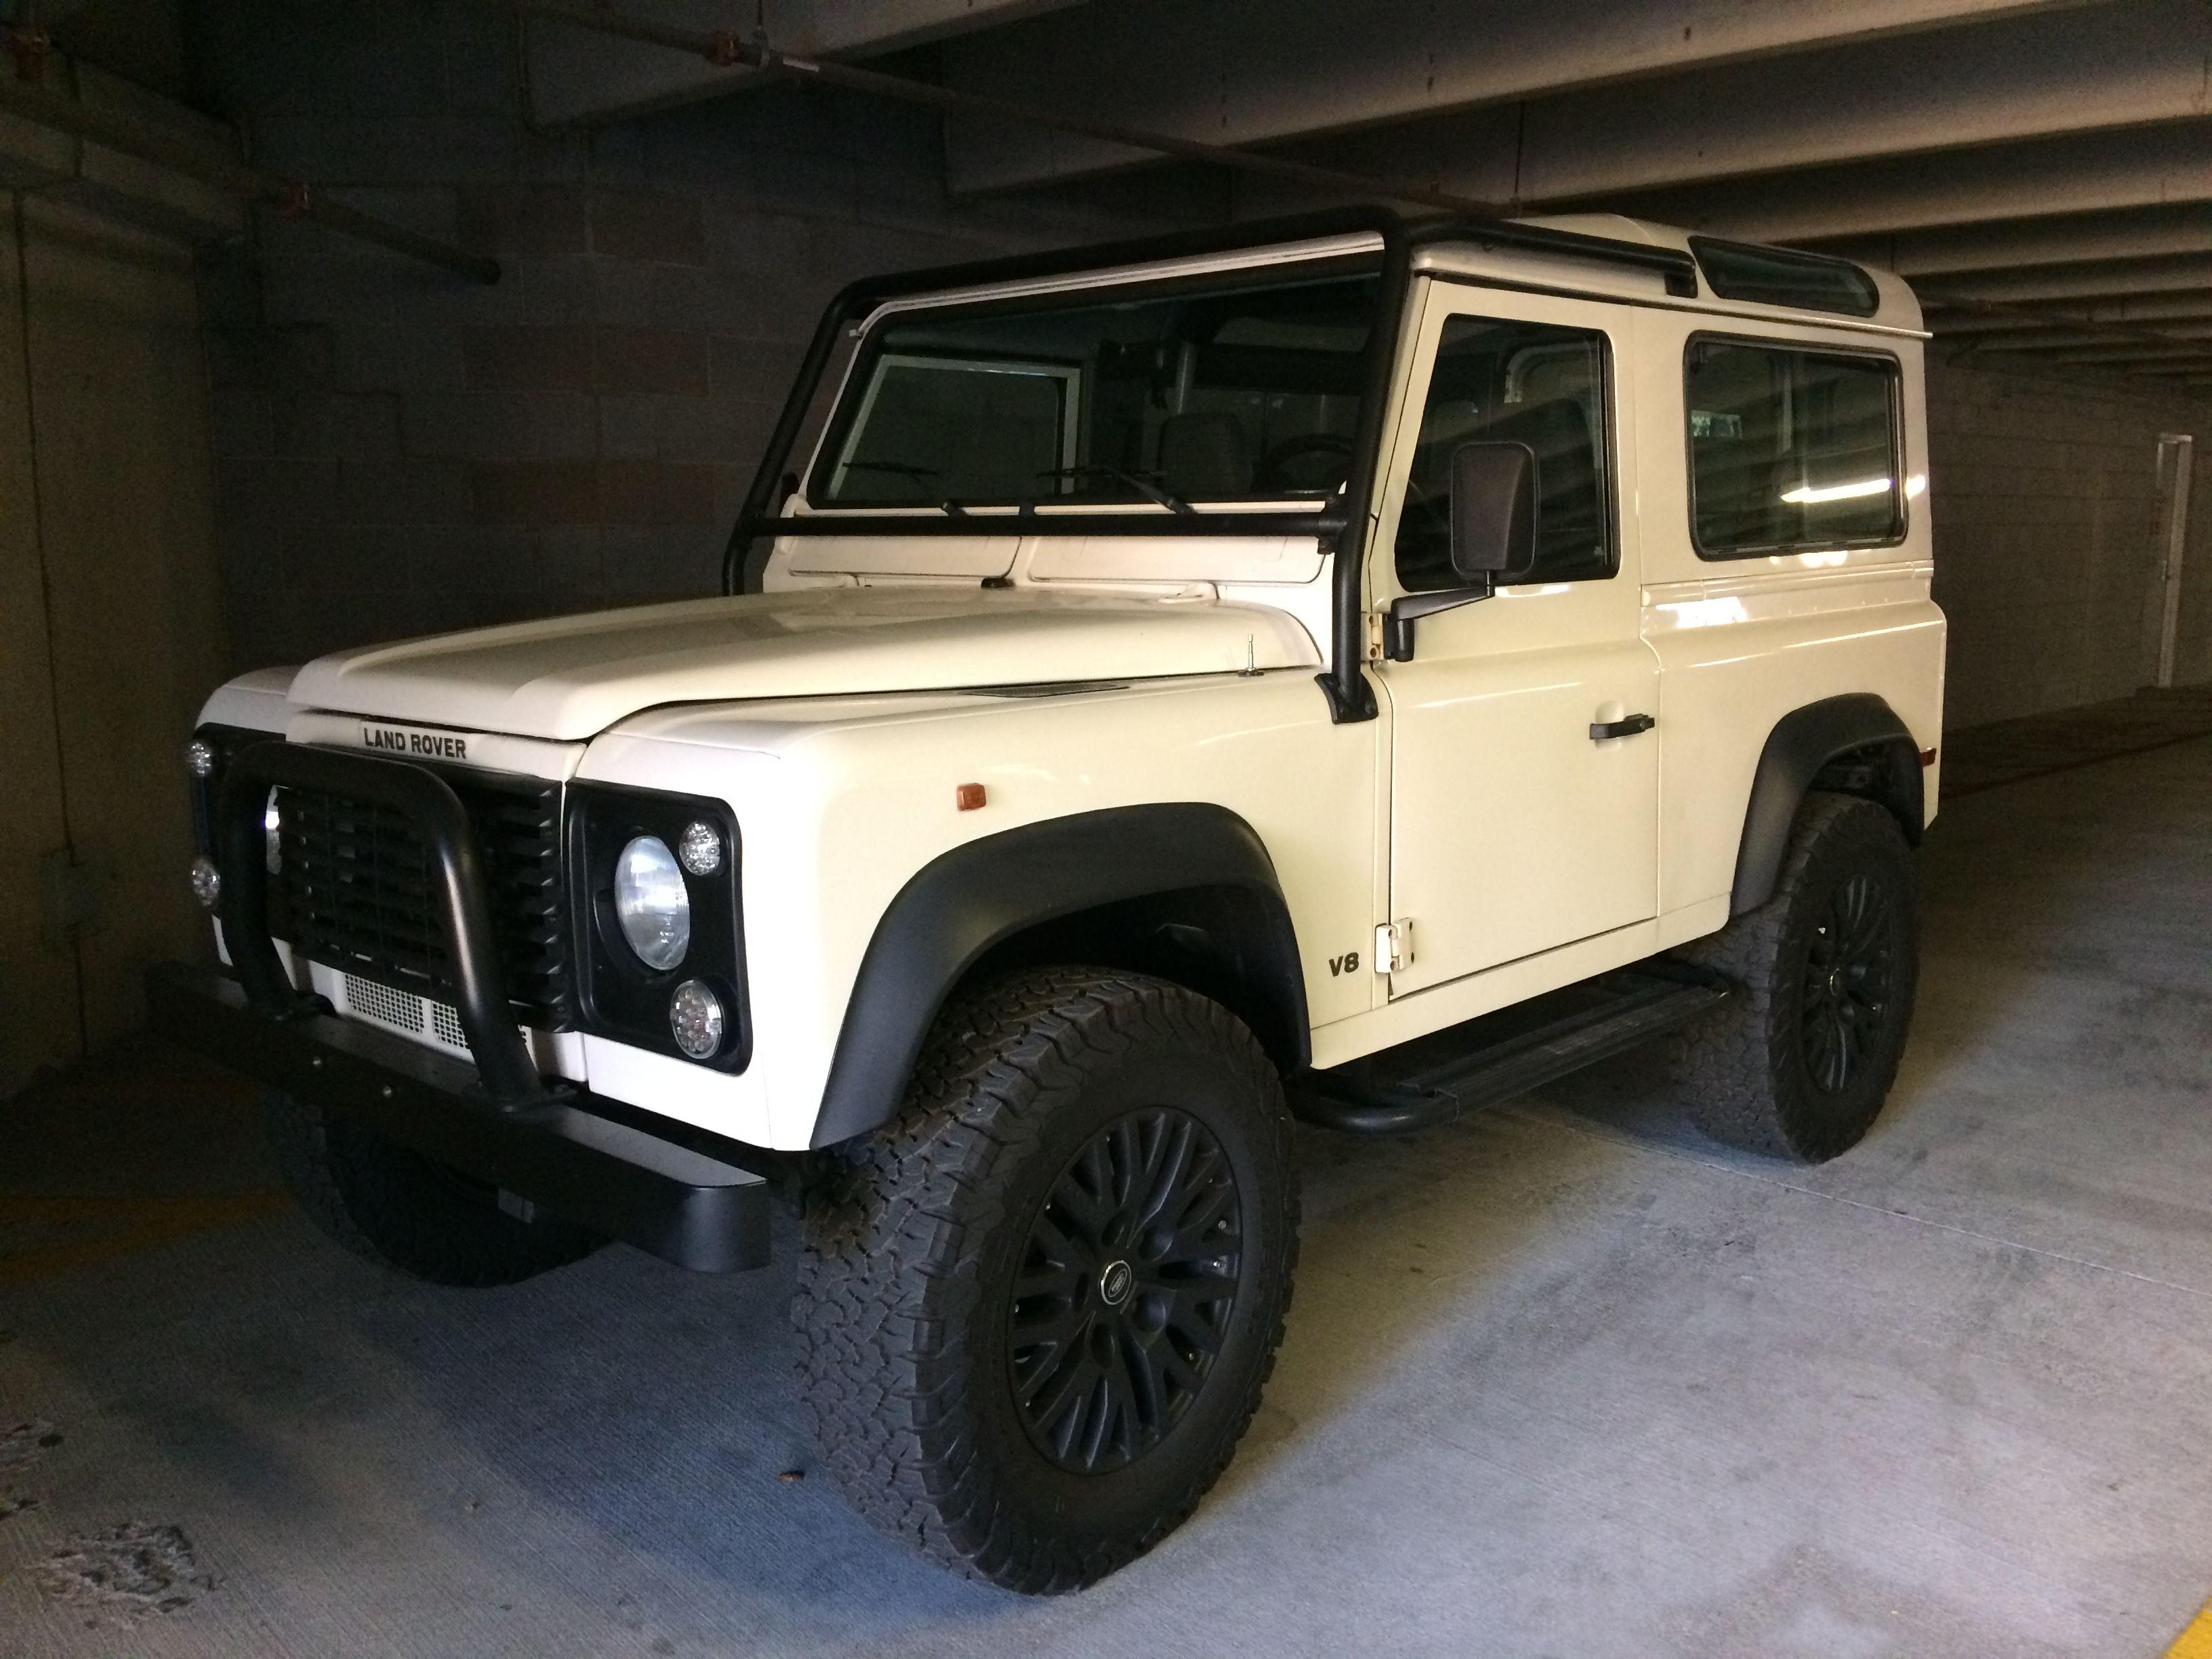 Classic White Land Rover Defender Land Rover Land Rover Defender Vintage Cars